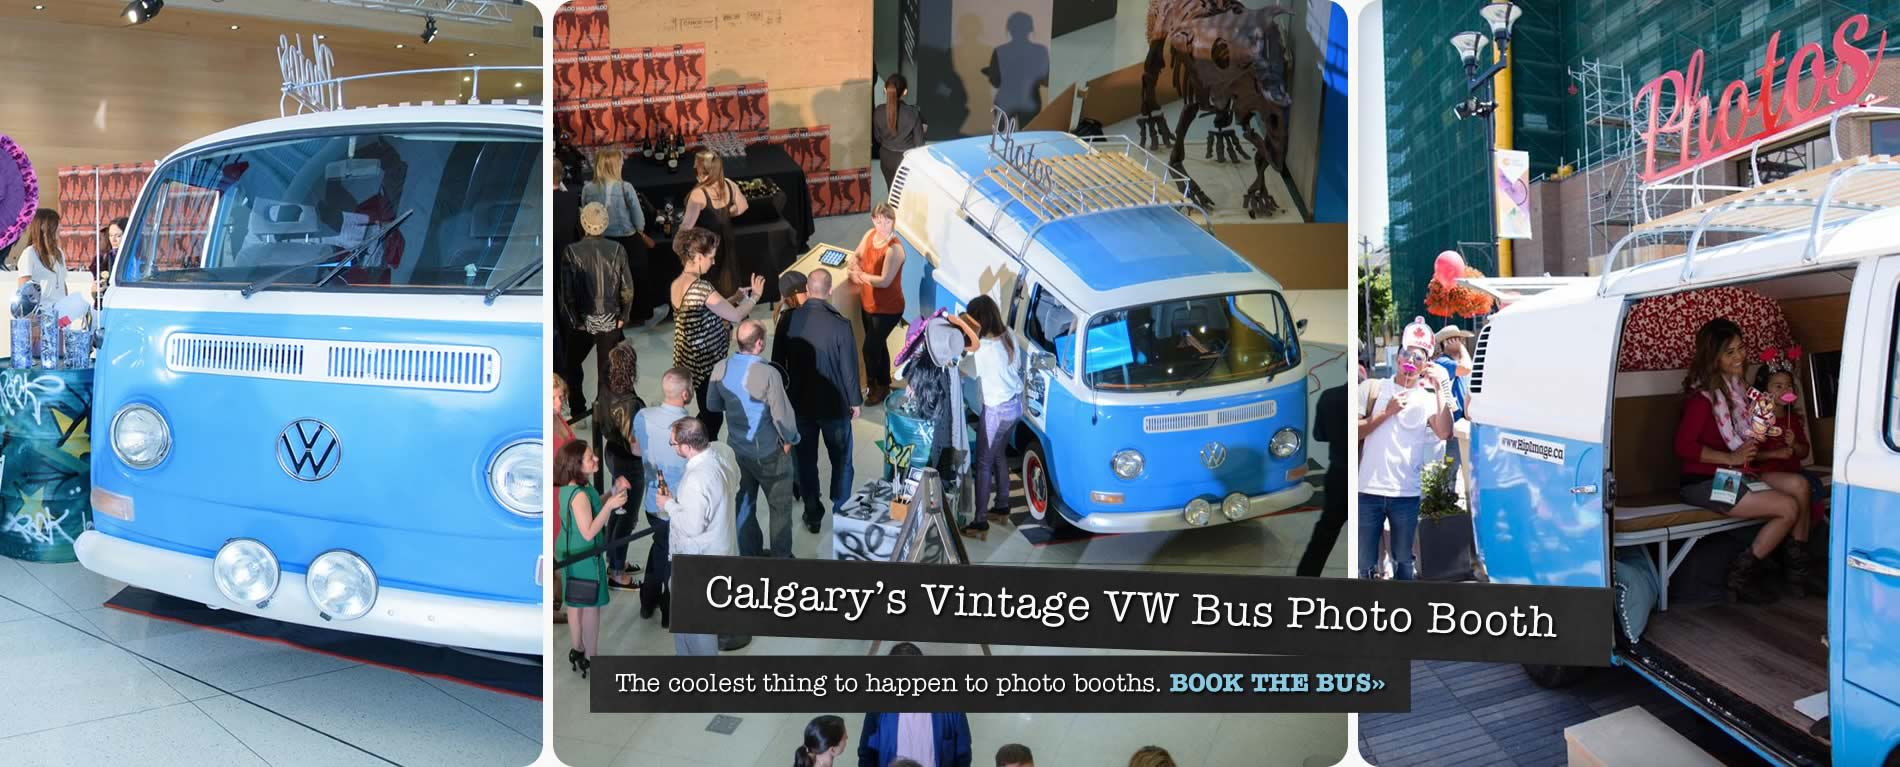 Calgary's Vintage VW Bus Photo Booth